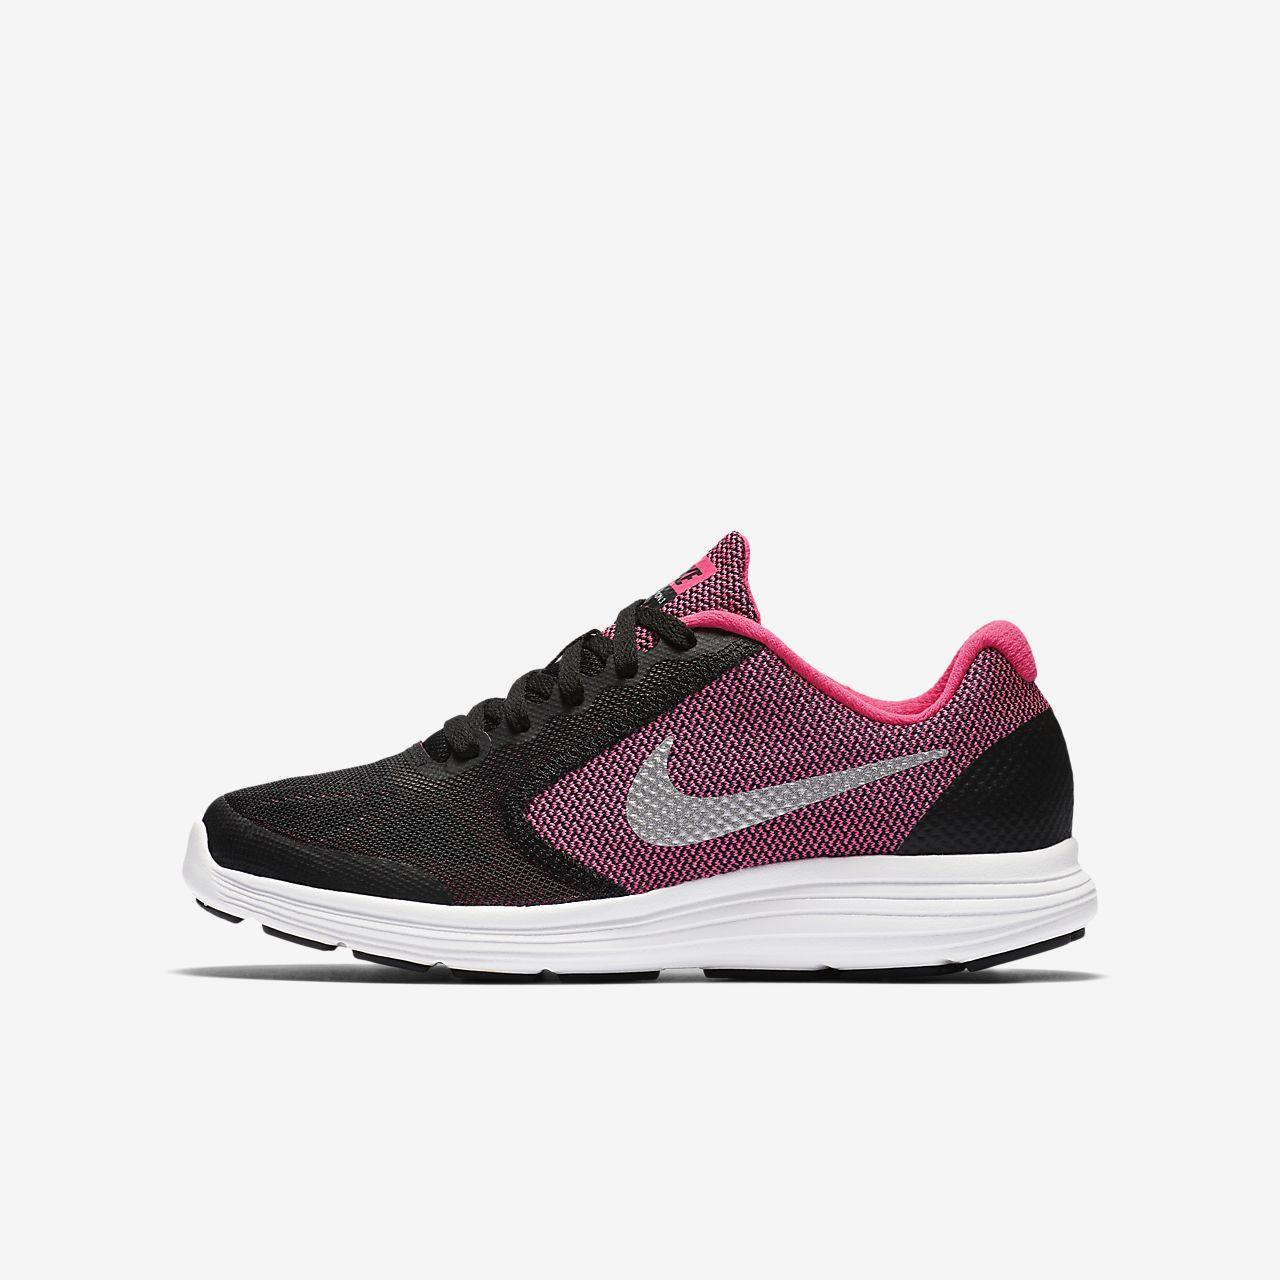 Chaussures Nike Revolution 3 uLDOGIK